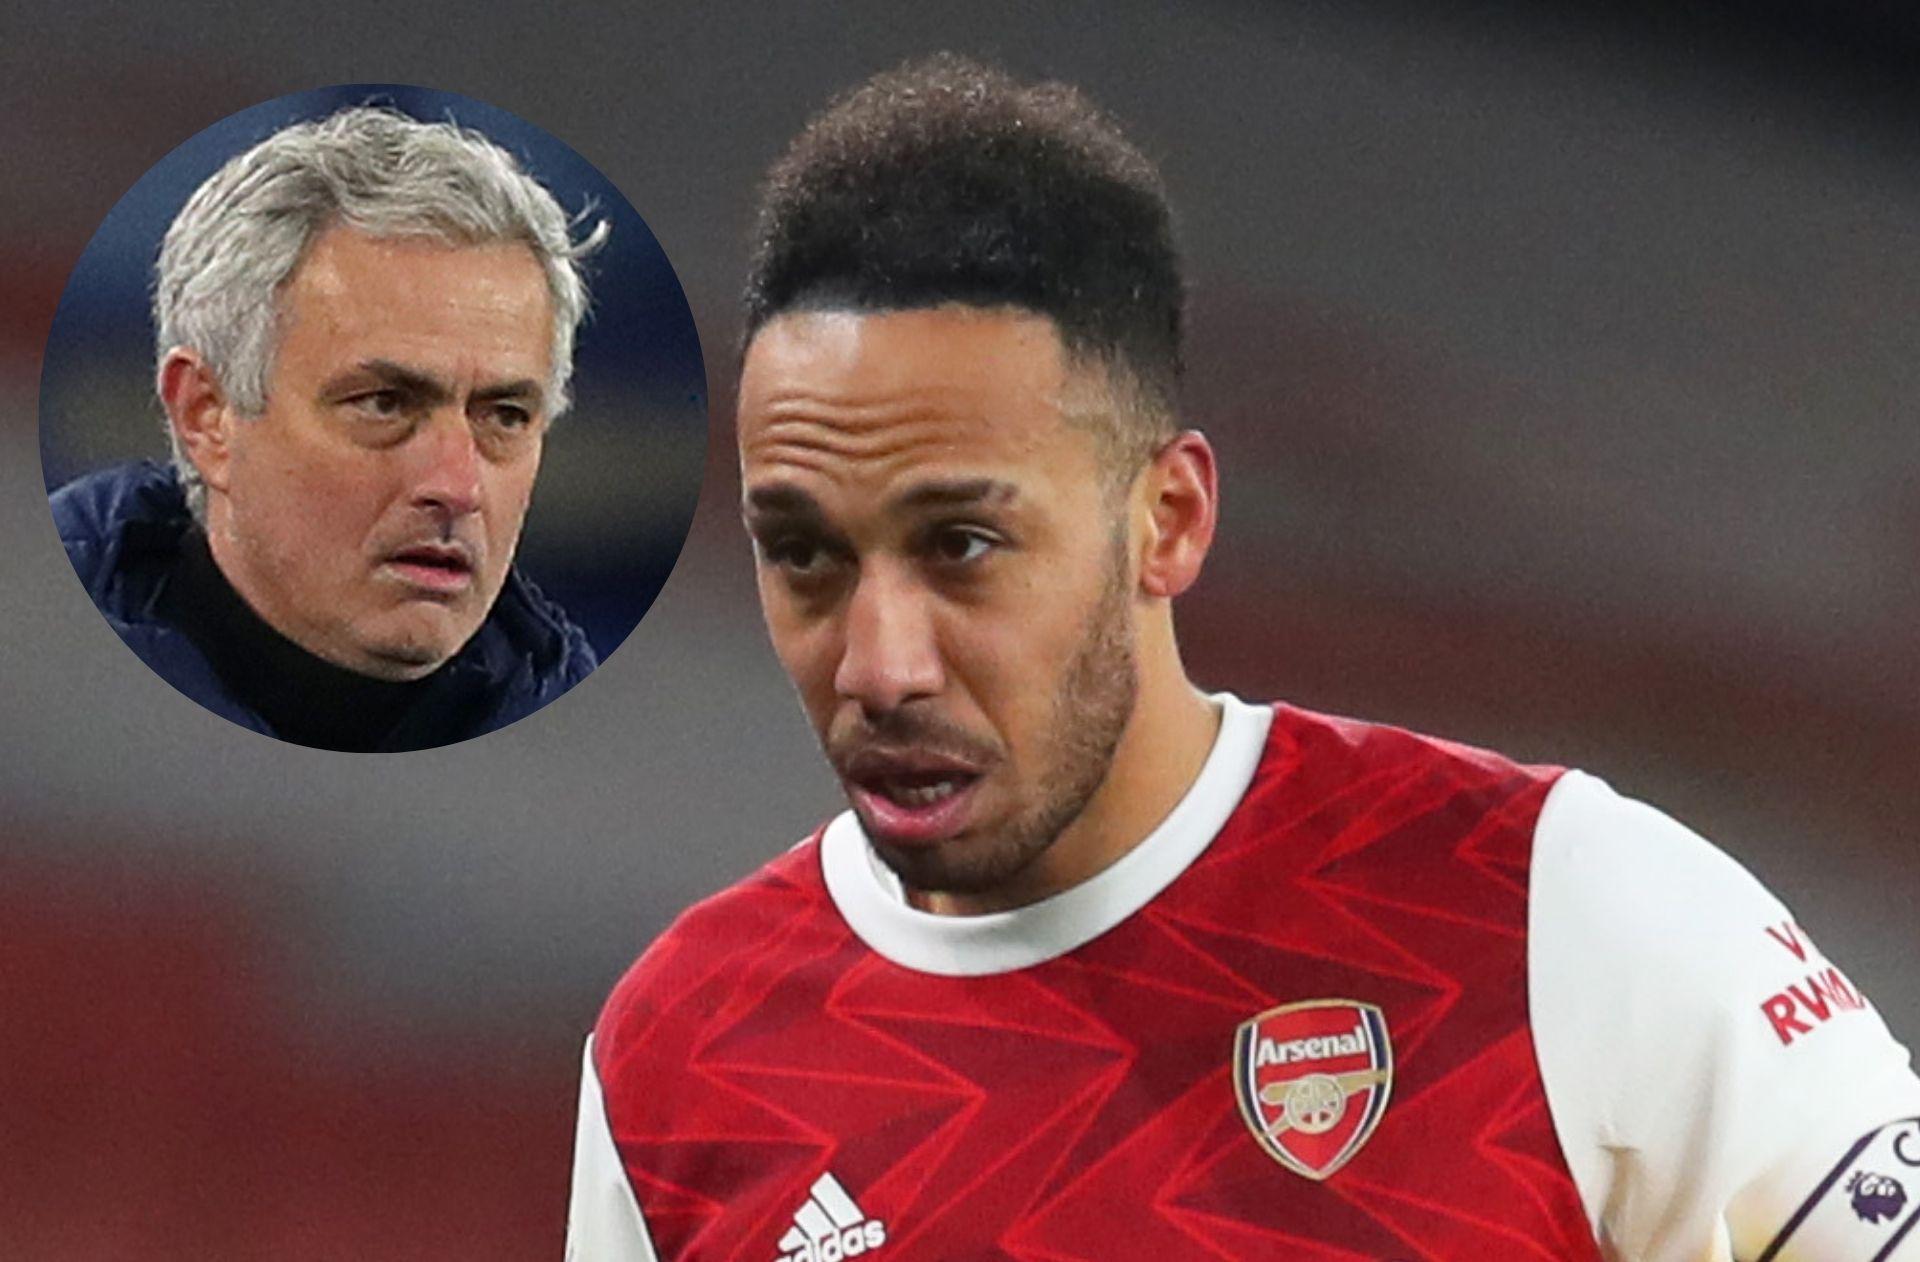 Pierre-emerick Aubameyang of Arsenal, Jose Mourinho of Tottenham